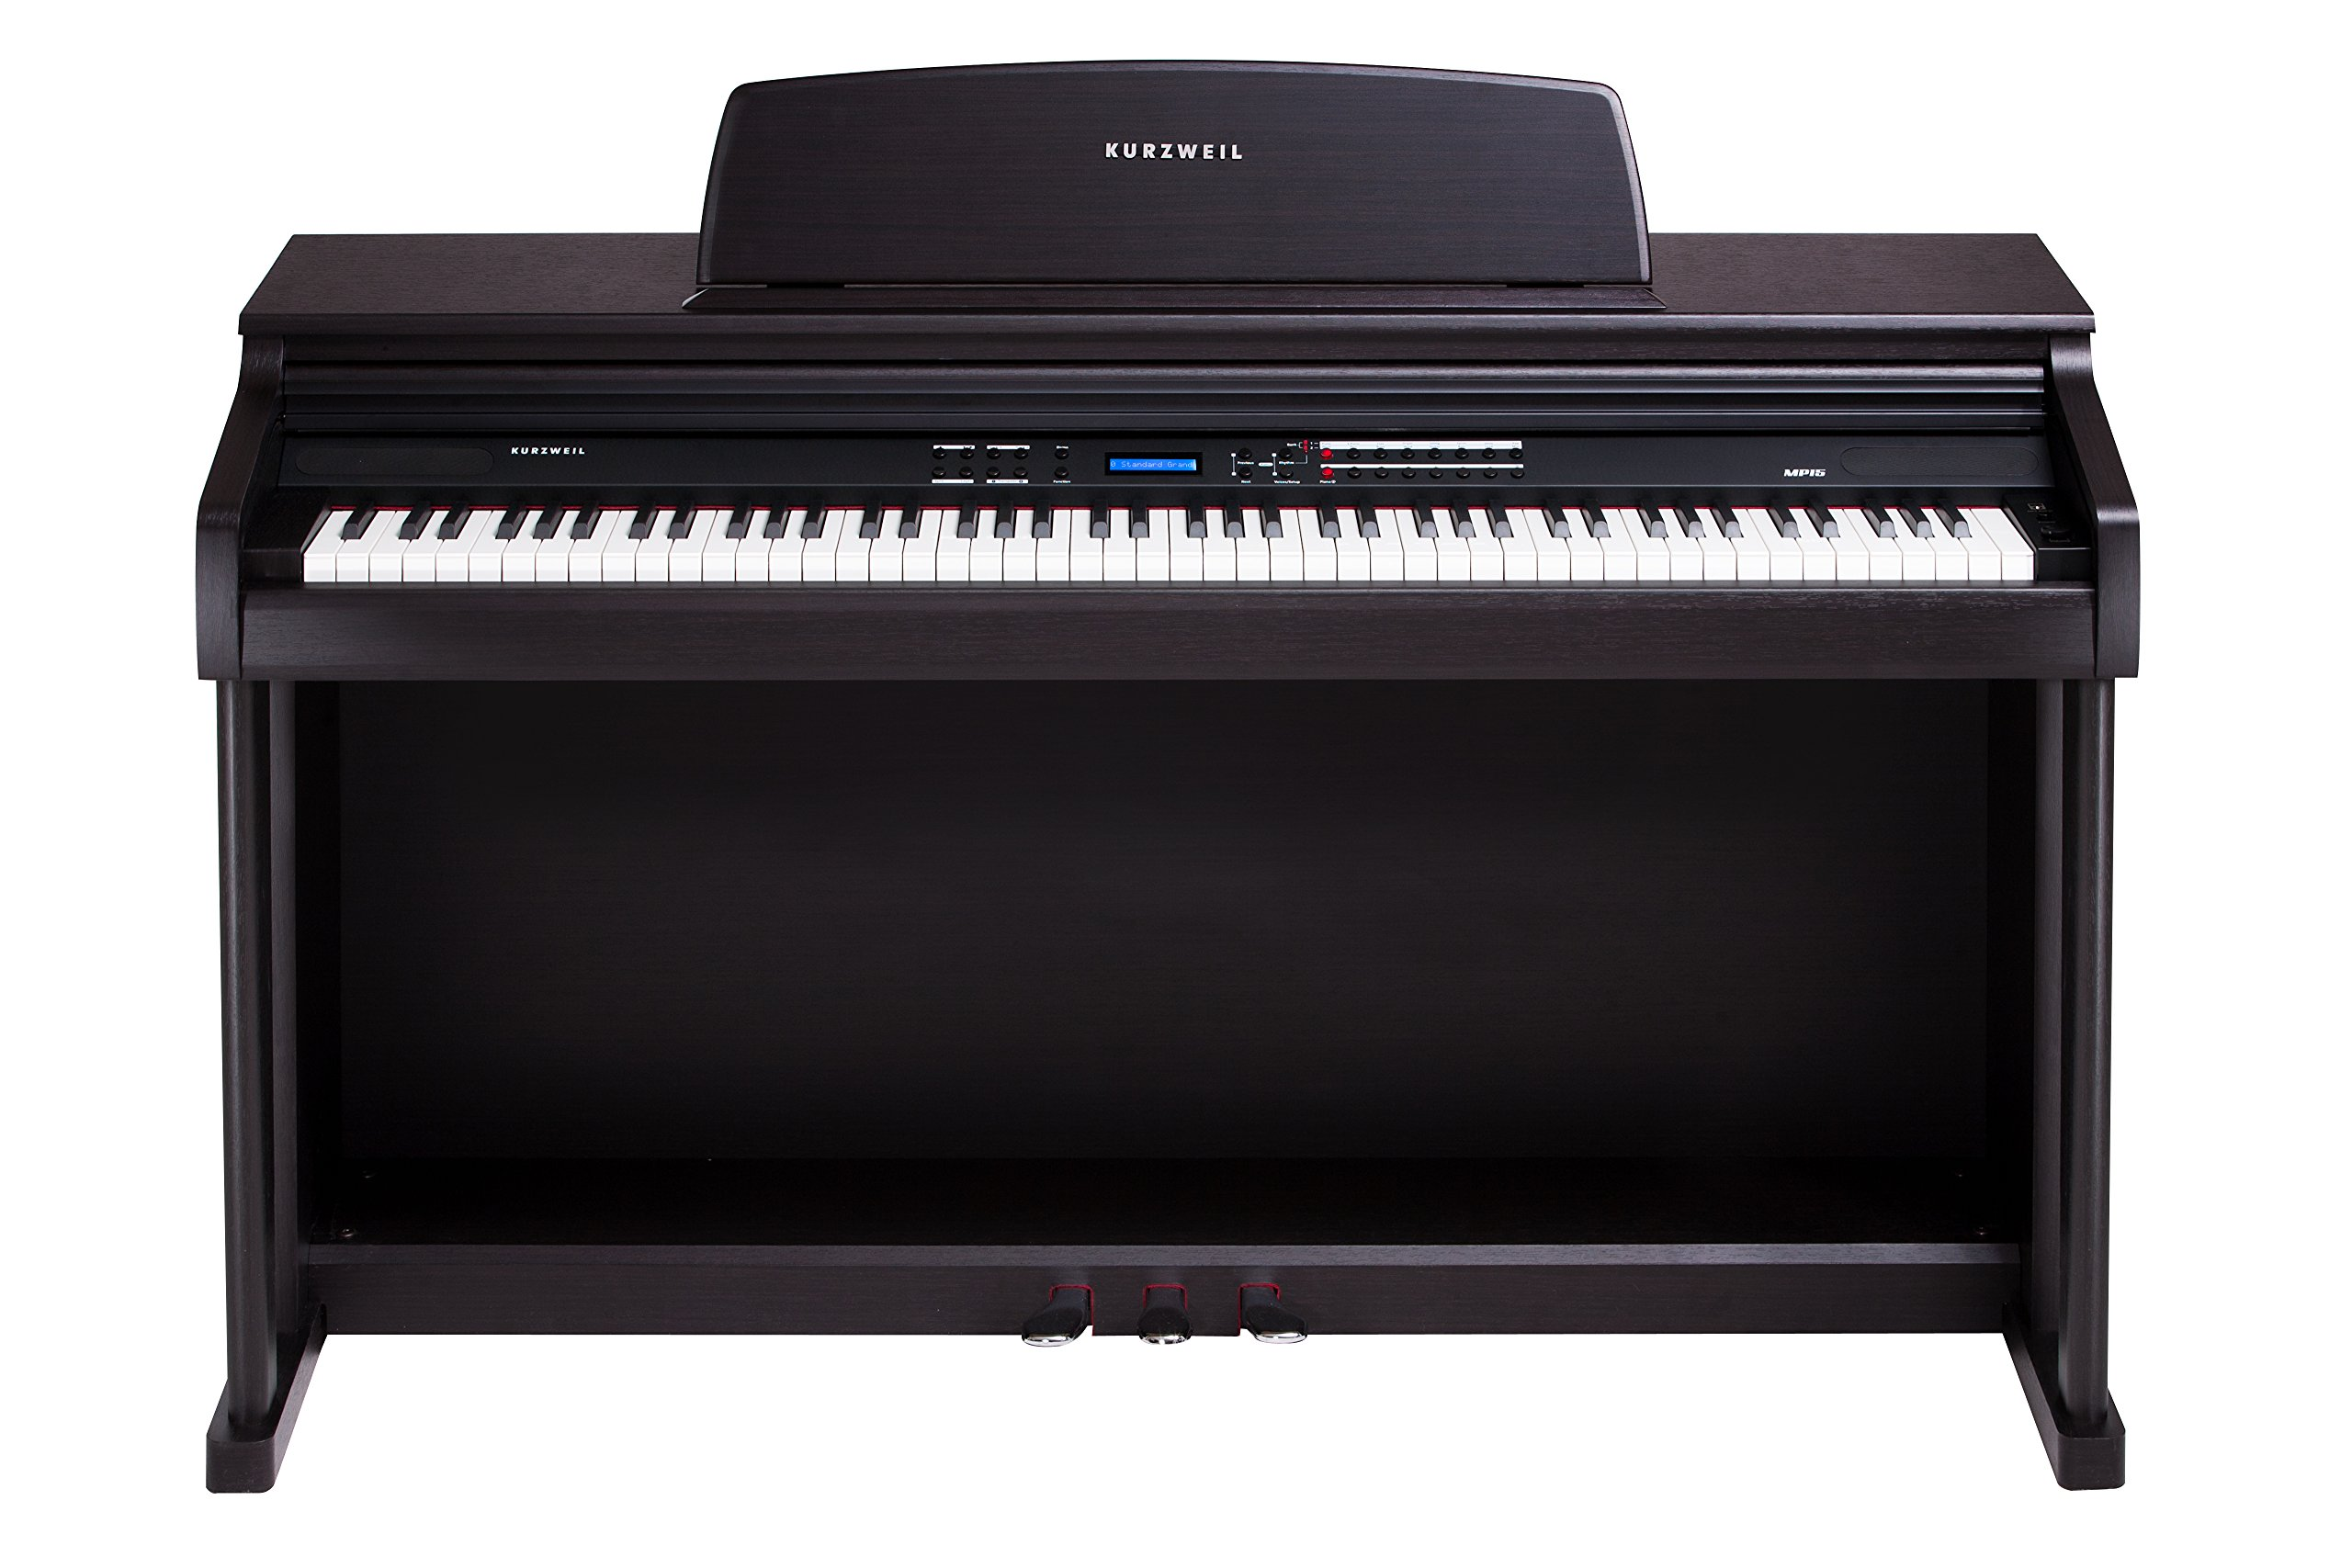 Kurzweil MP15 Student/Teacher Digital Piano, Rosewood